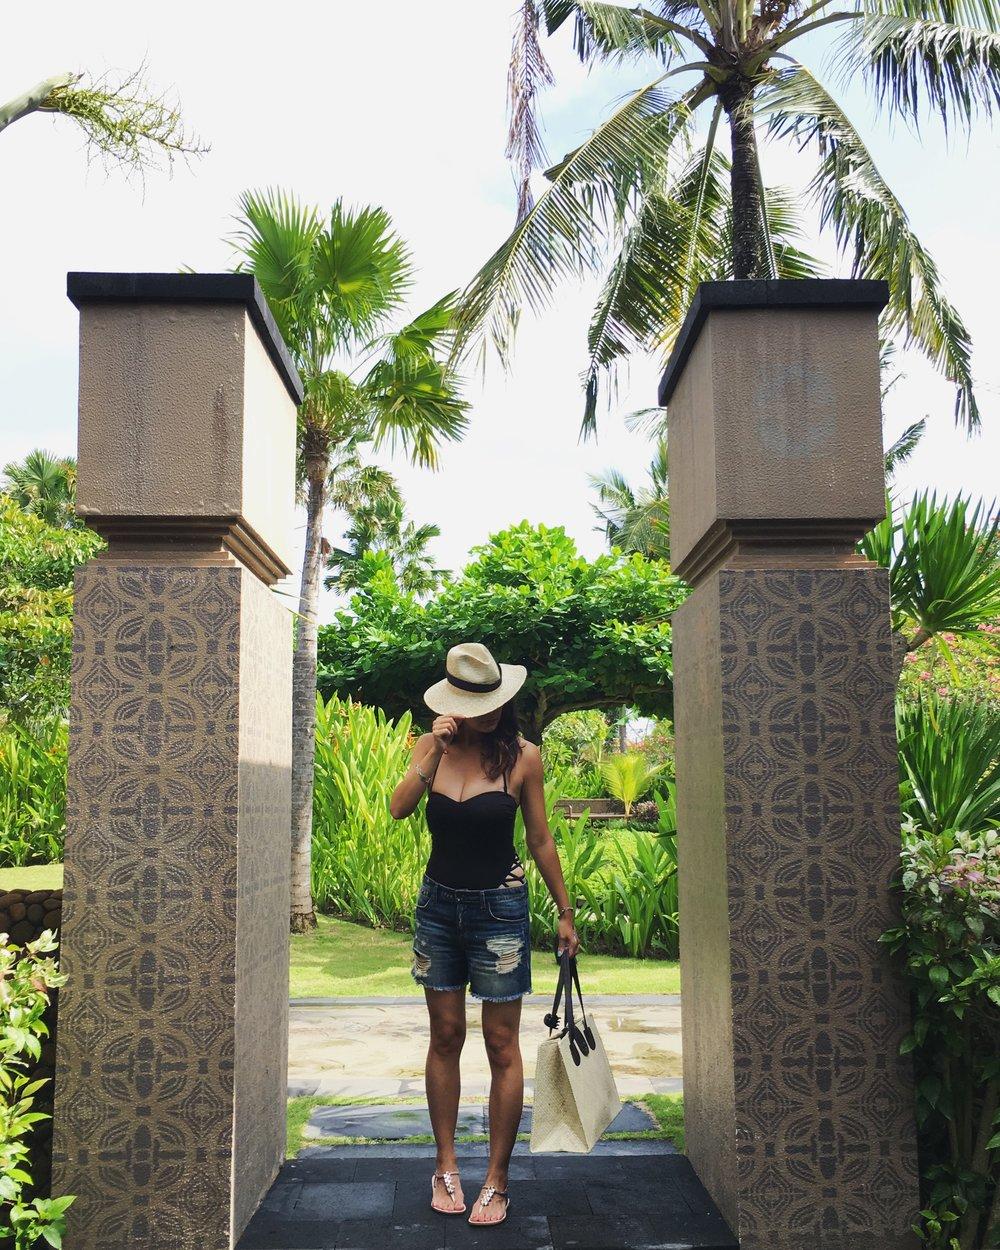 Kenneth Cole Swimsuit /  Joe Jeans Shorts  /  Impanema Sandals  / St. Regis Hotel Hat & Beach Bag (from hotel)